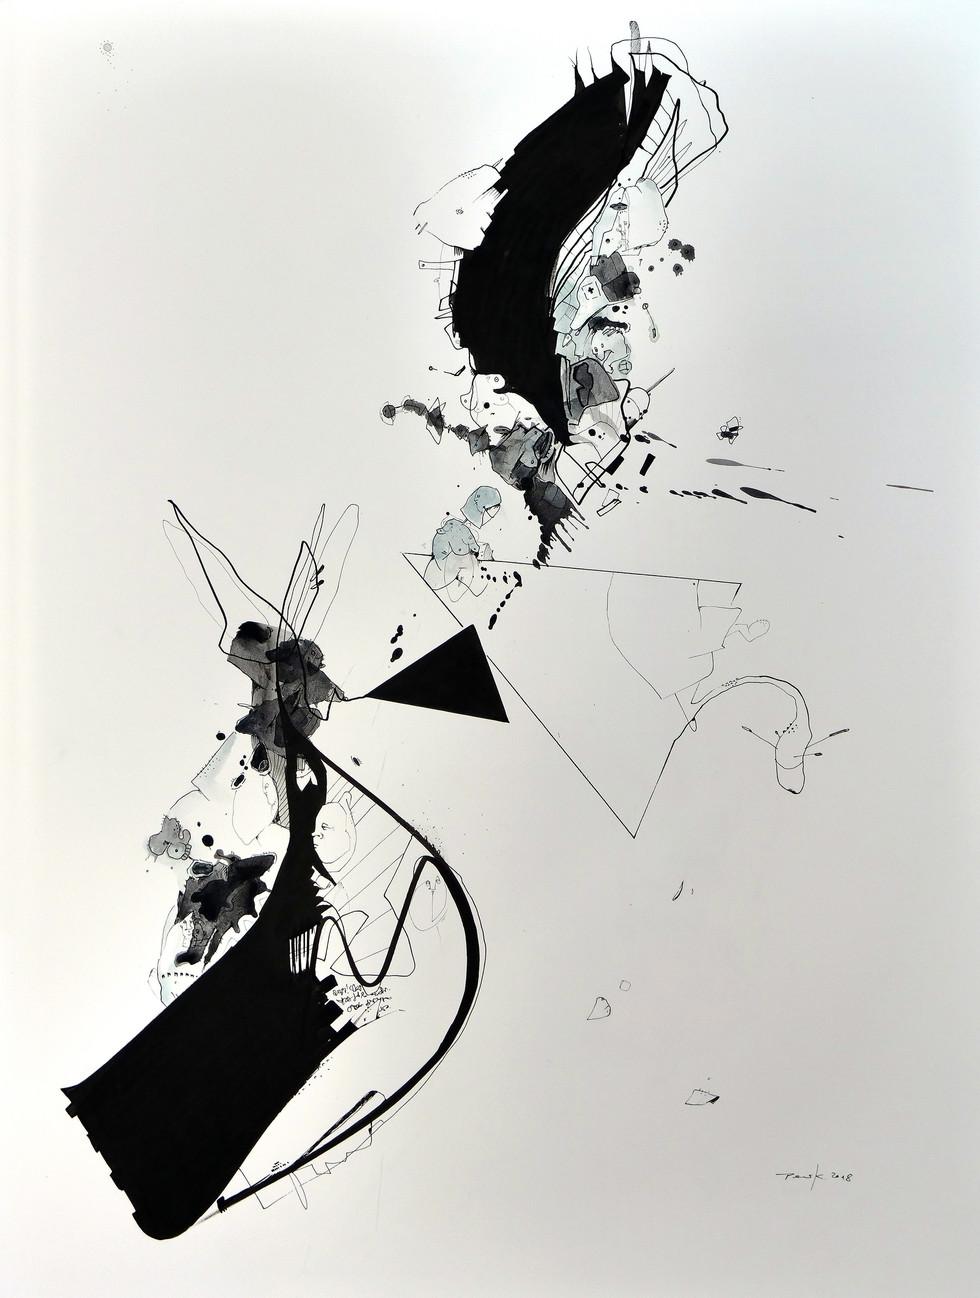 Frost 2018 Aquarell, Acryl, Pigmenttusche auf Papier 61 x 46 cm